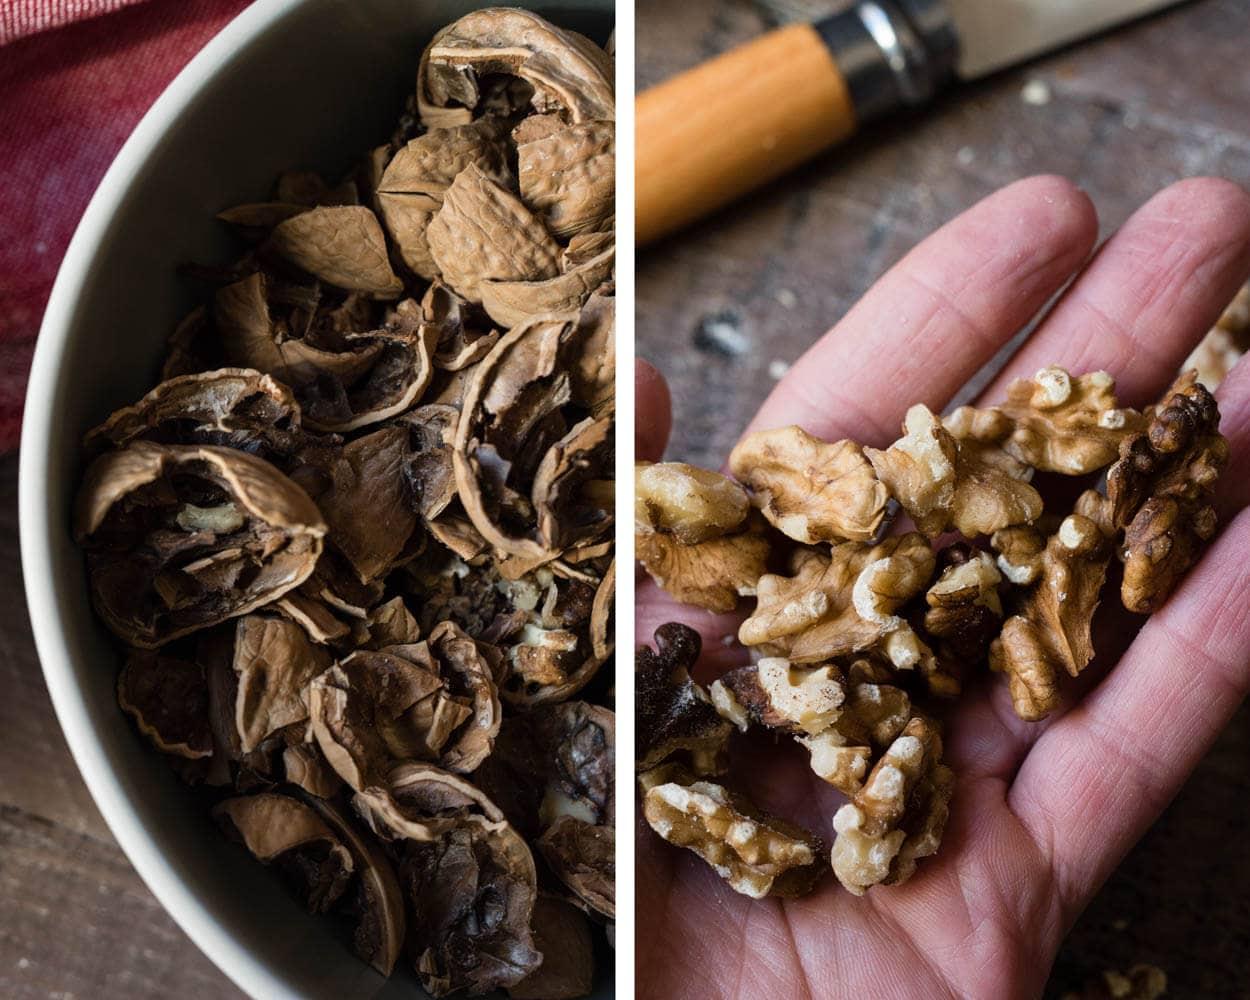 shelled organic walnuts